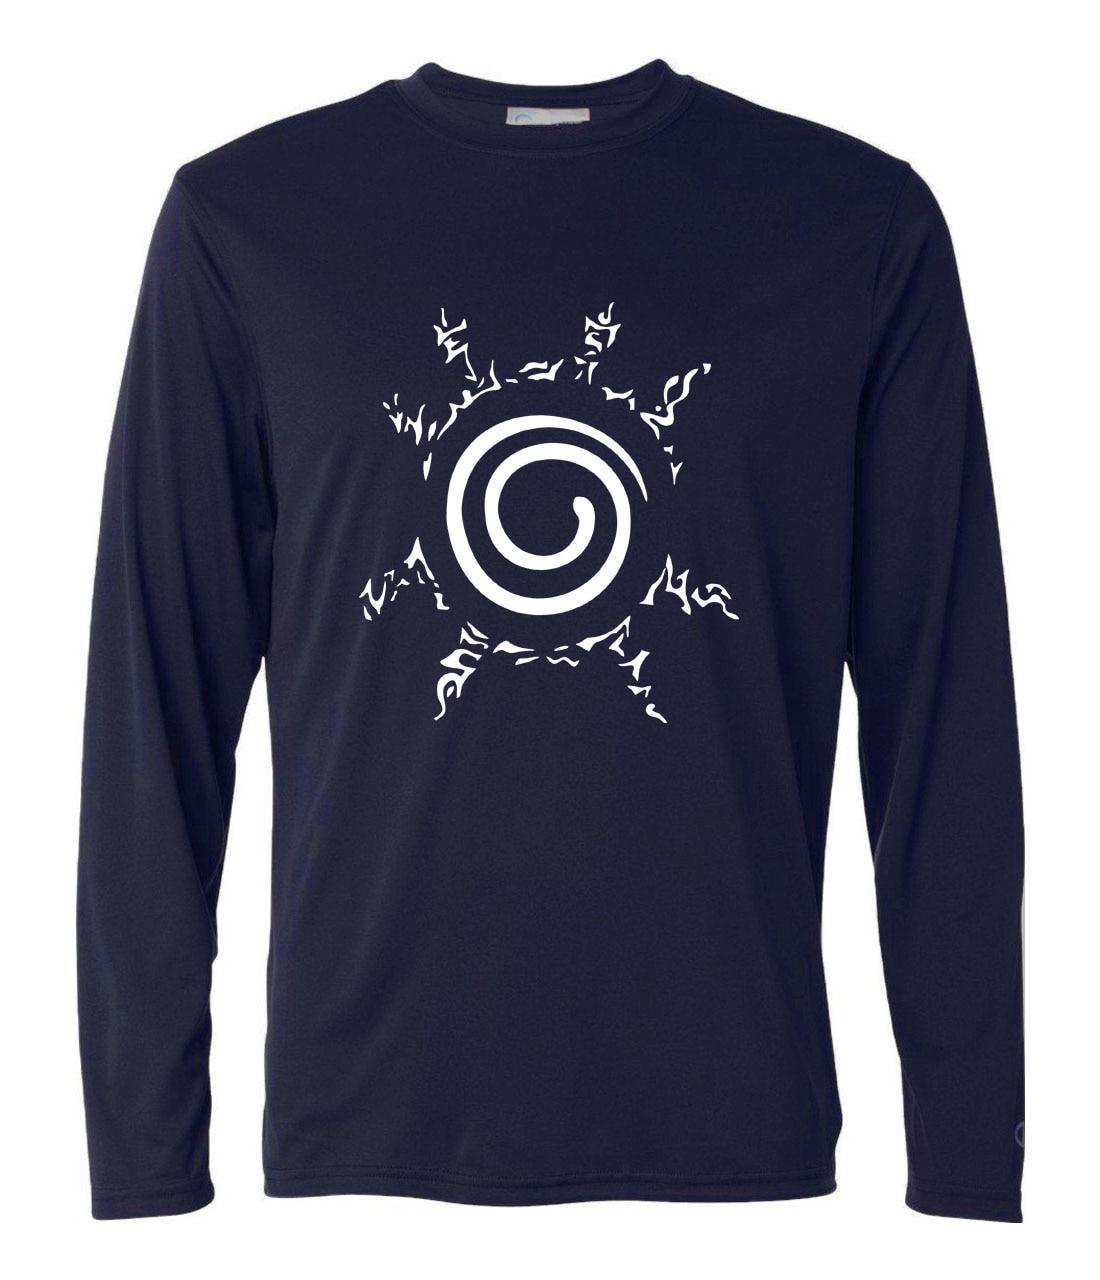 Popular funny Uzumaki Naruto hipster t-shirt men 2019 hip-hop long sleeve camisetas casual cotton harajuku brand clothing homme